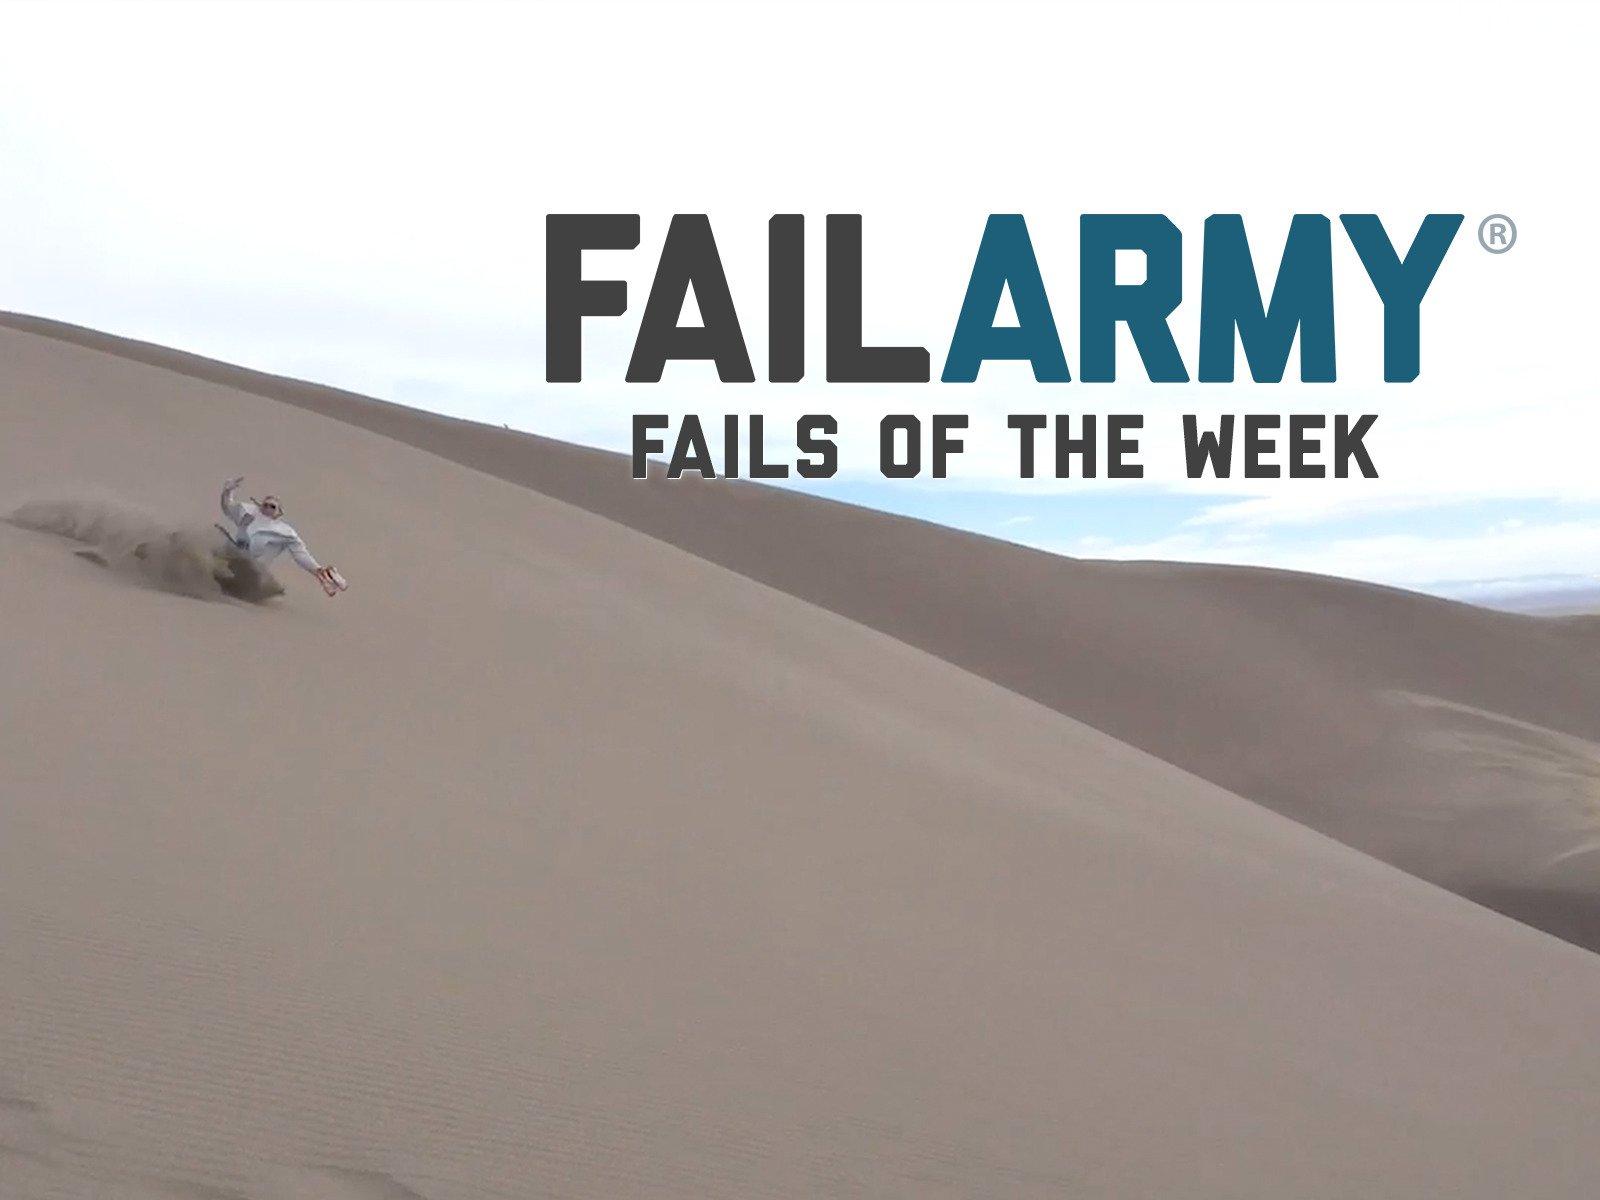 Clip: Fails of the Week - Season 13